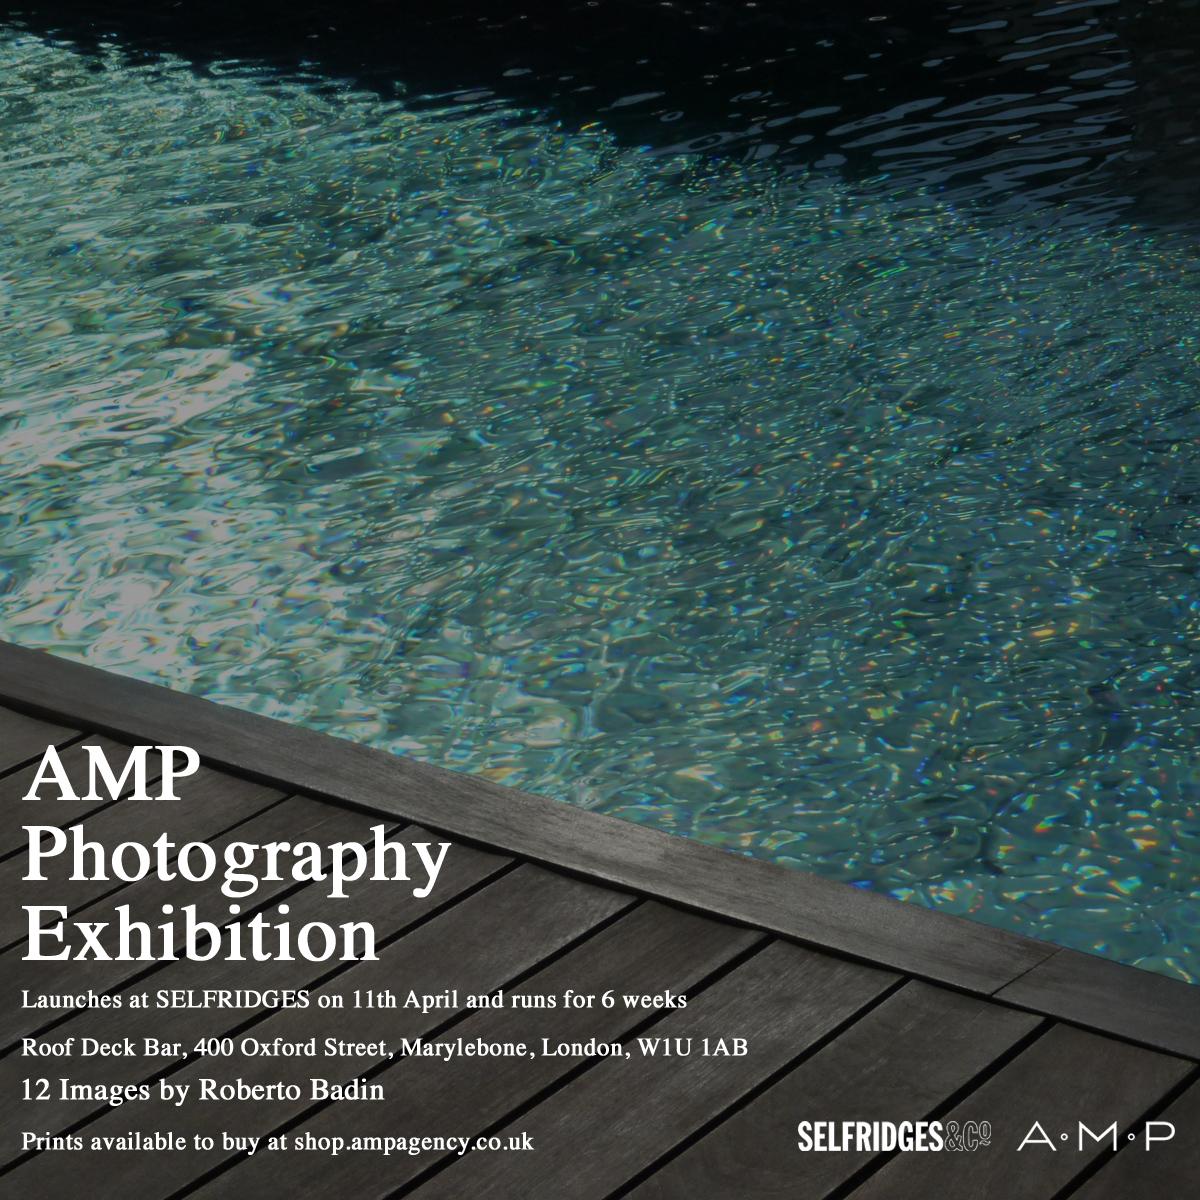 AMP_Expo_Site.jpg